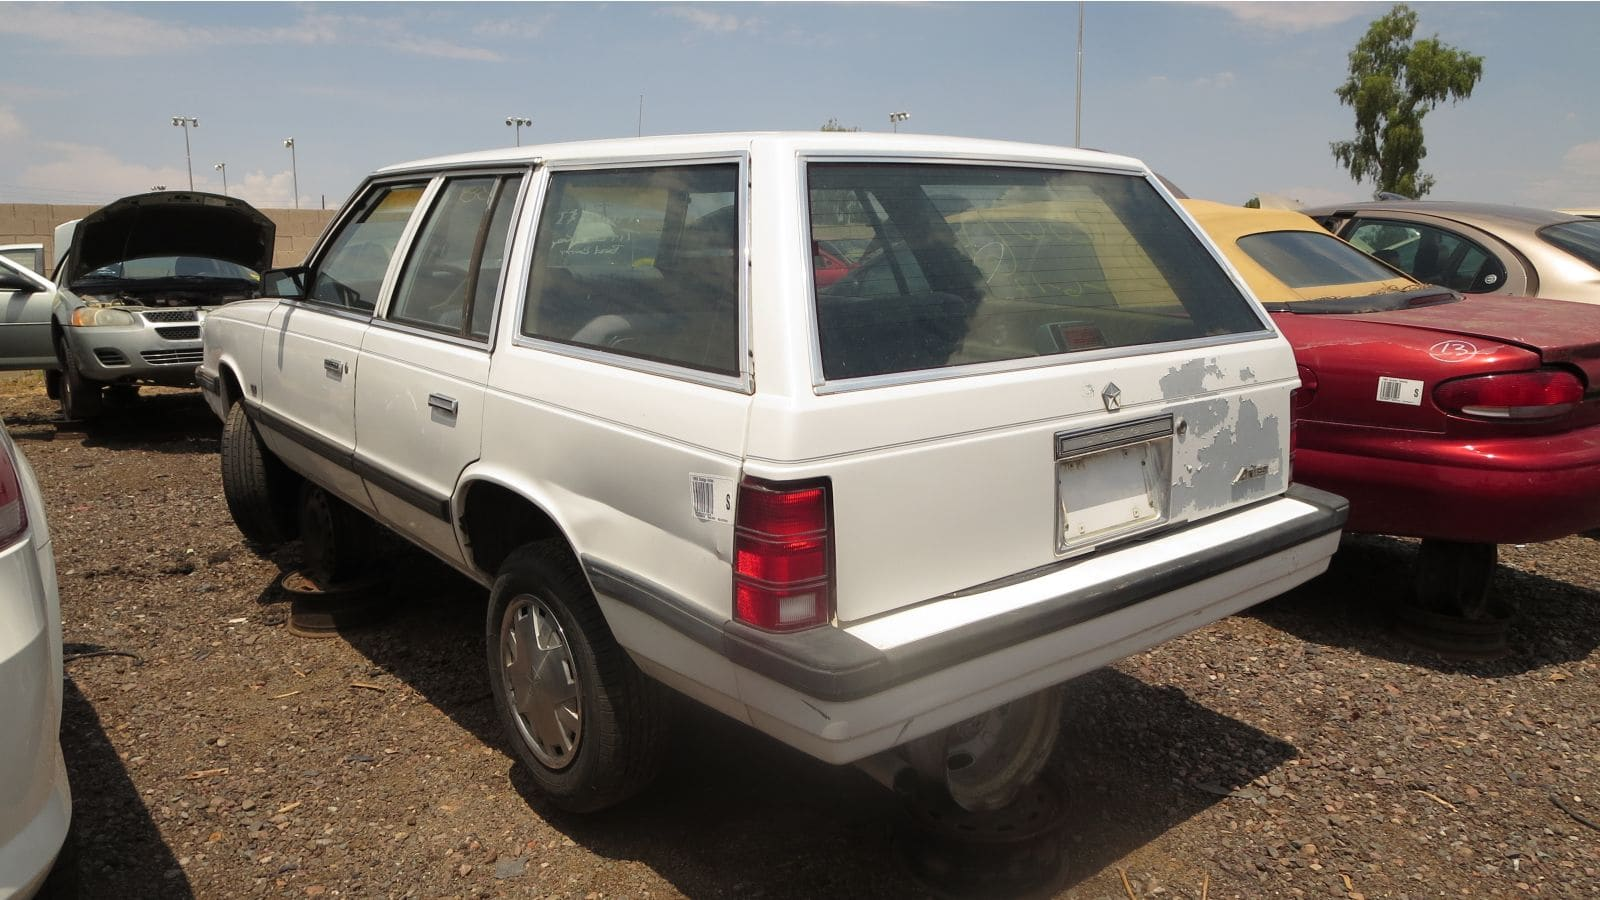 Junked 1988 Dodge Aries wagon